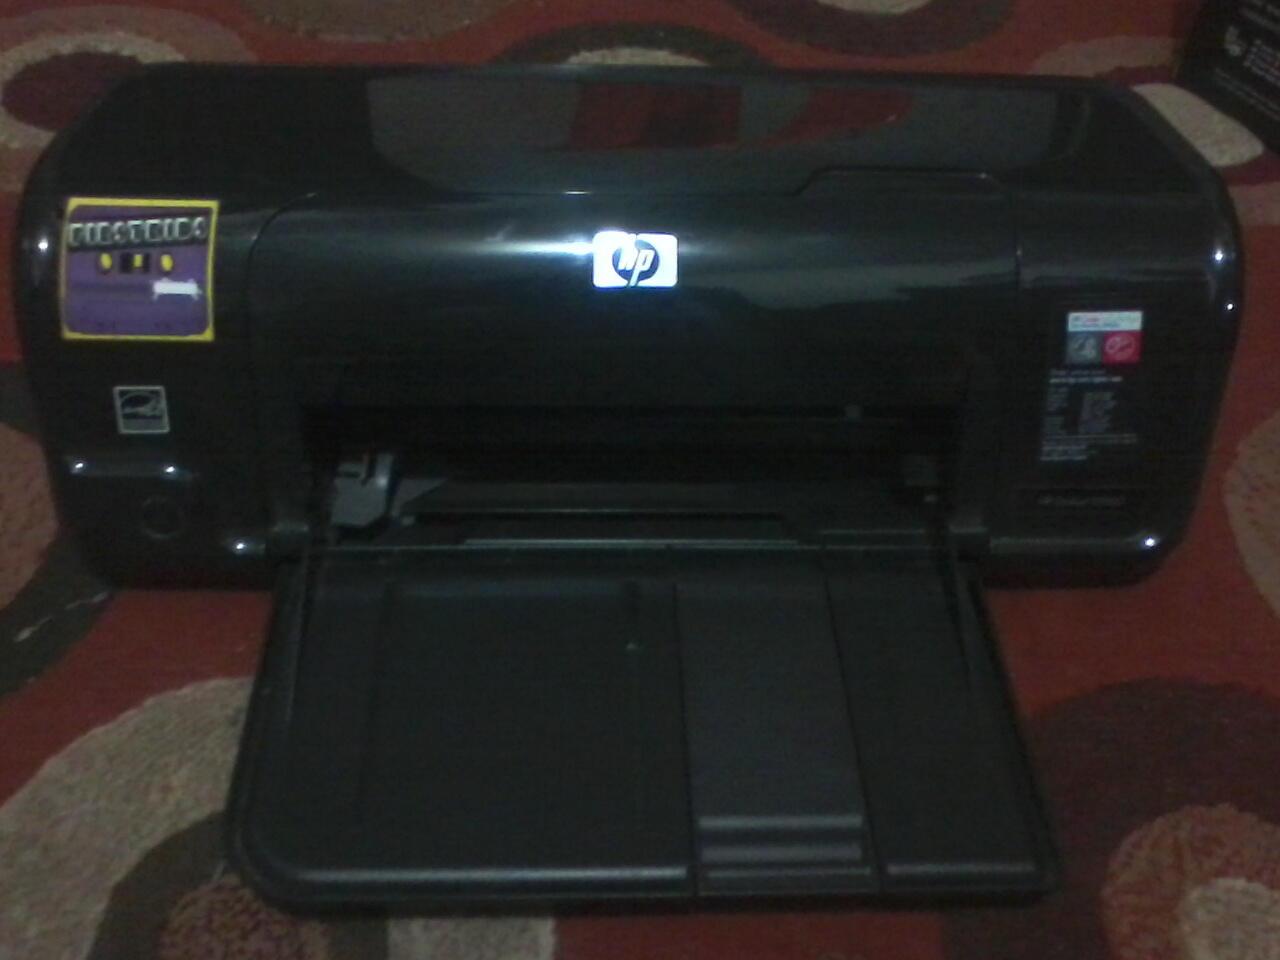 Jual Printer HP Deskjet D1160